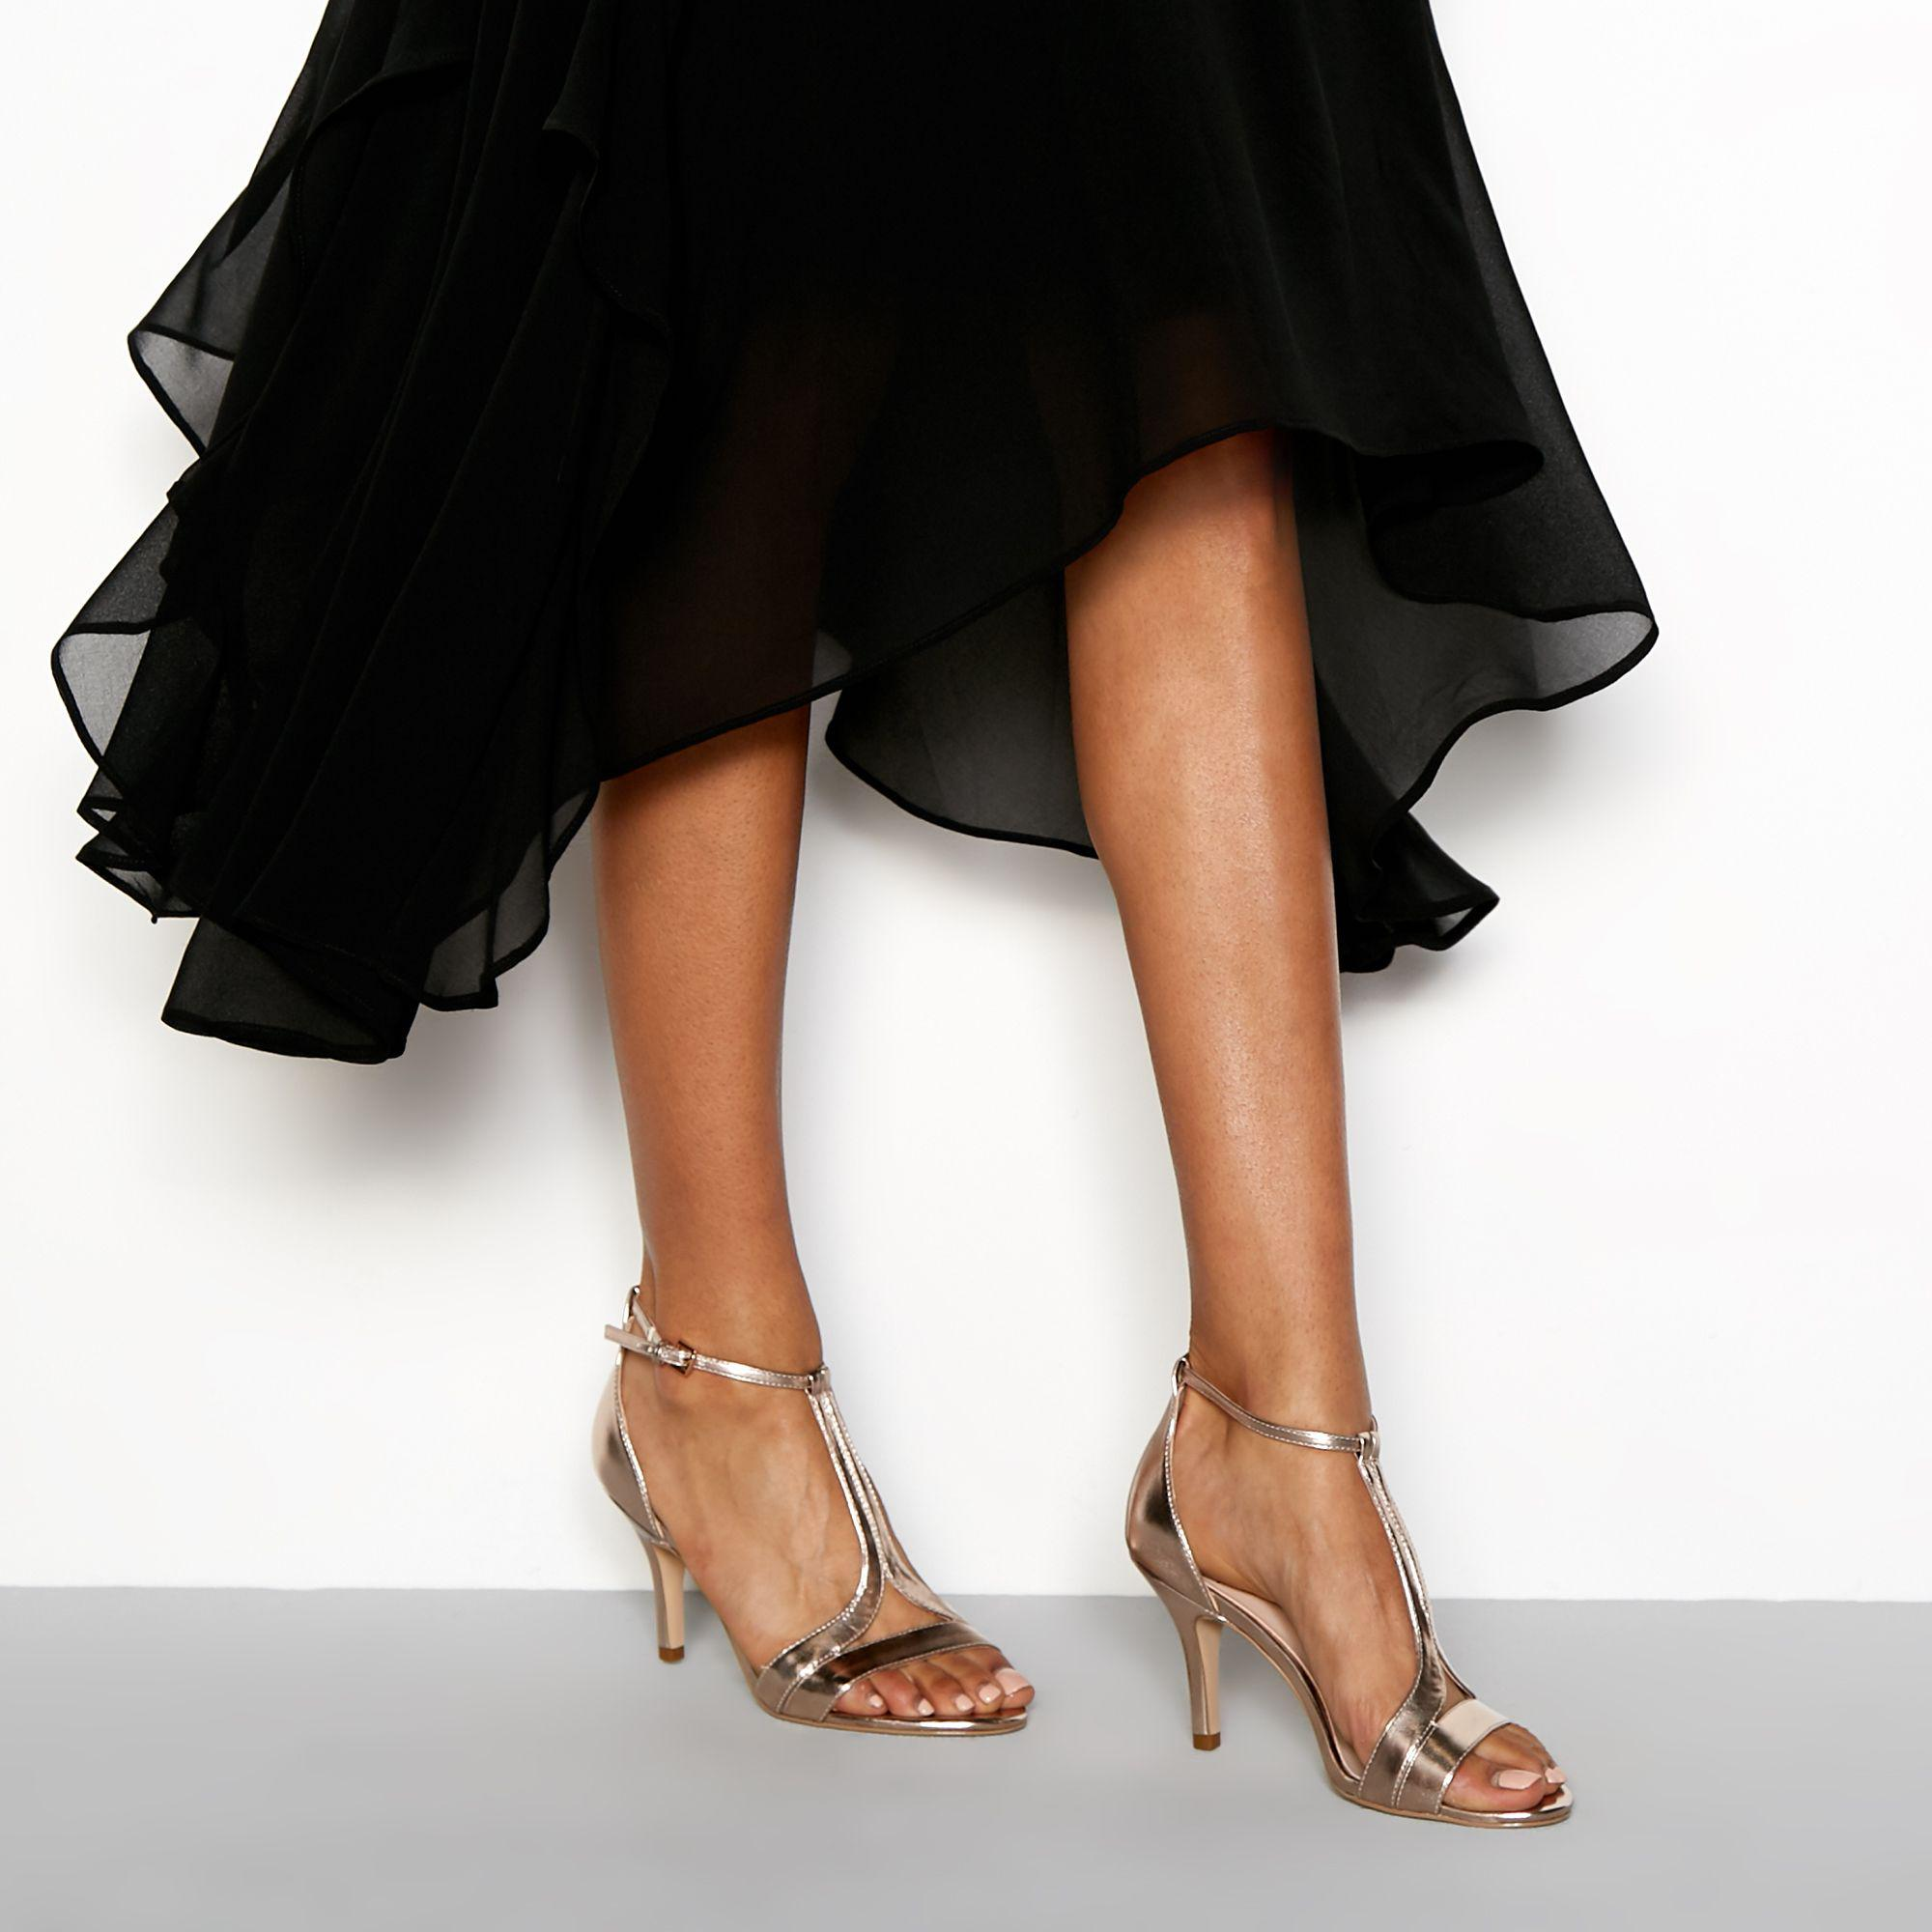 c3aff9acb Faith Rose  donna  T-bar Stiletto Heels Sandals - Lyst